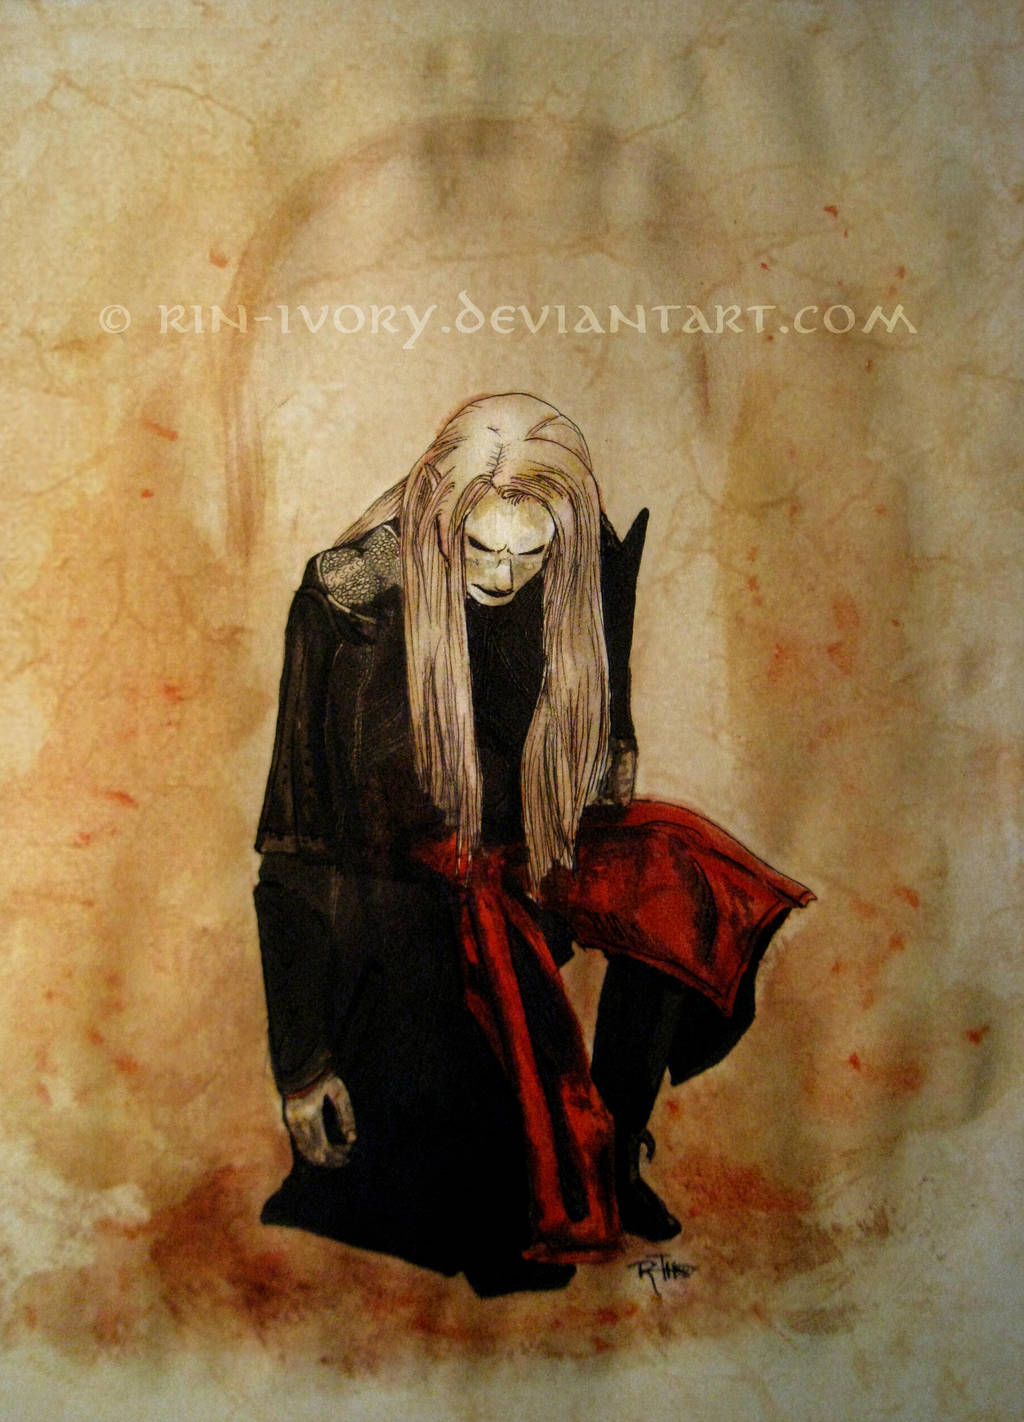 Prince Nuada Silverlance by ElverynelCreations